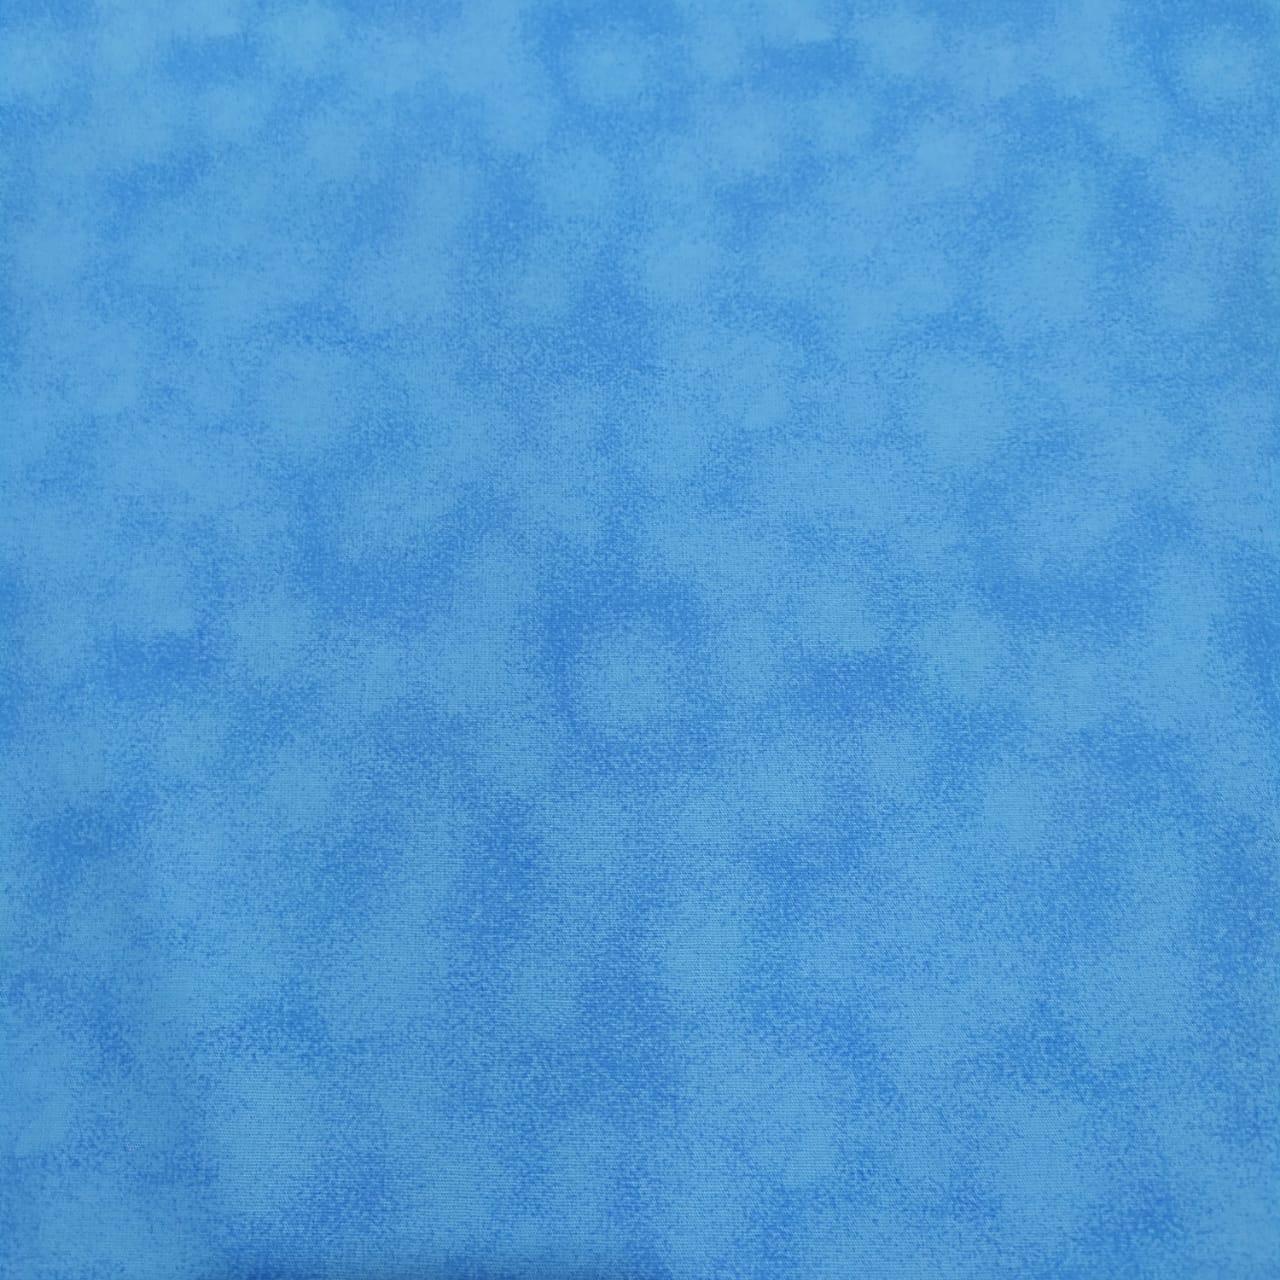 Poeirinha Azul